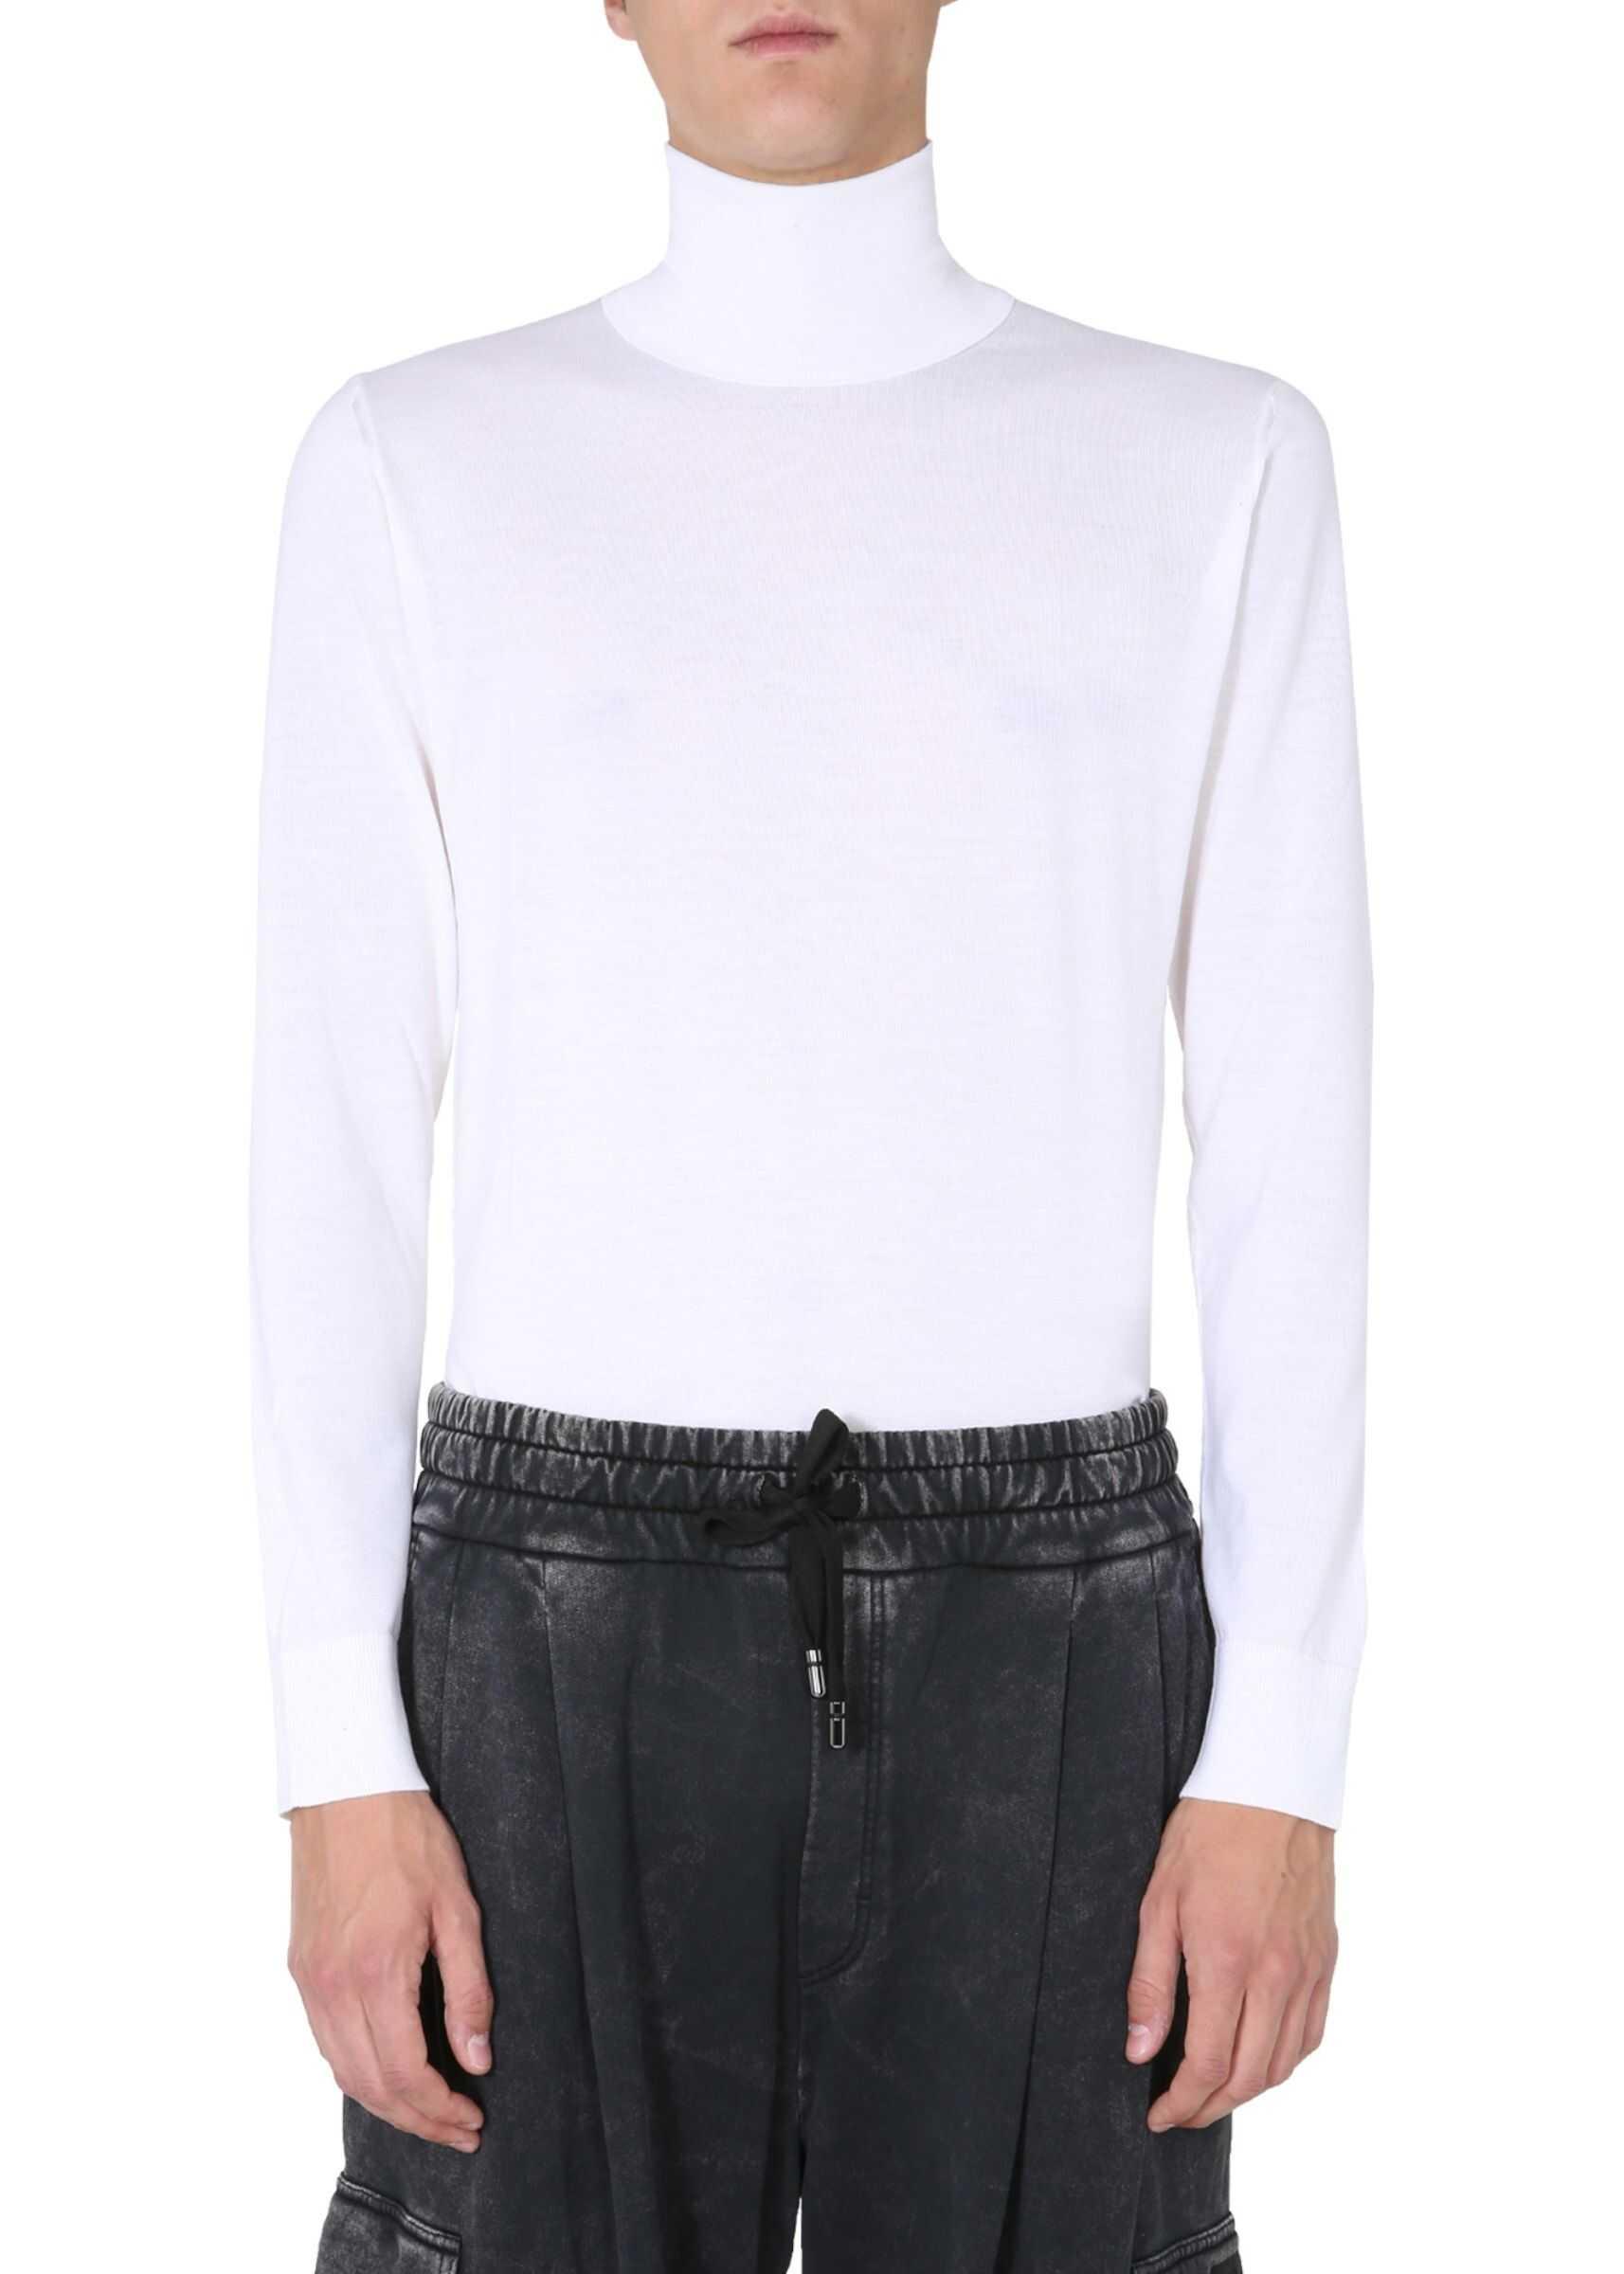 Dolce & Gabbana Turtleneck Sweater WHITE imagine